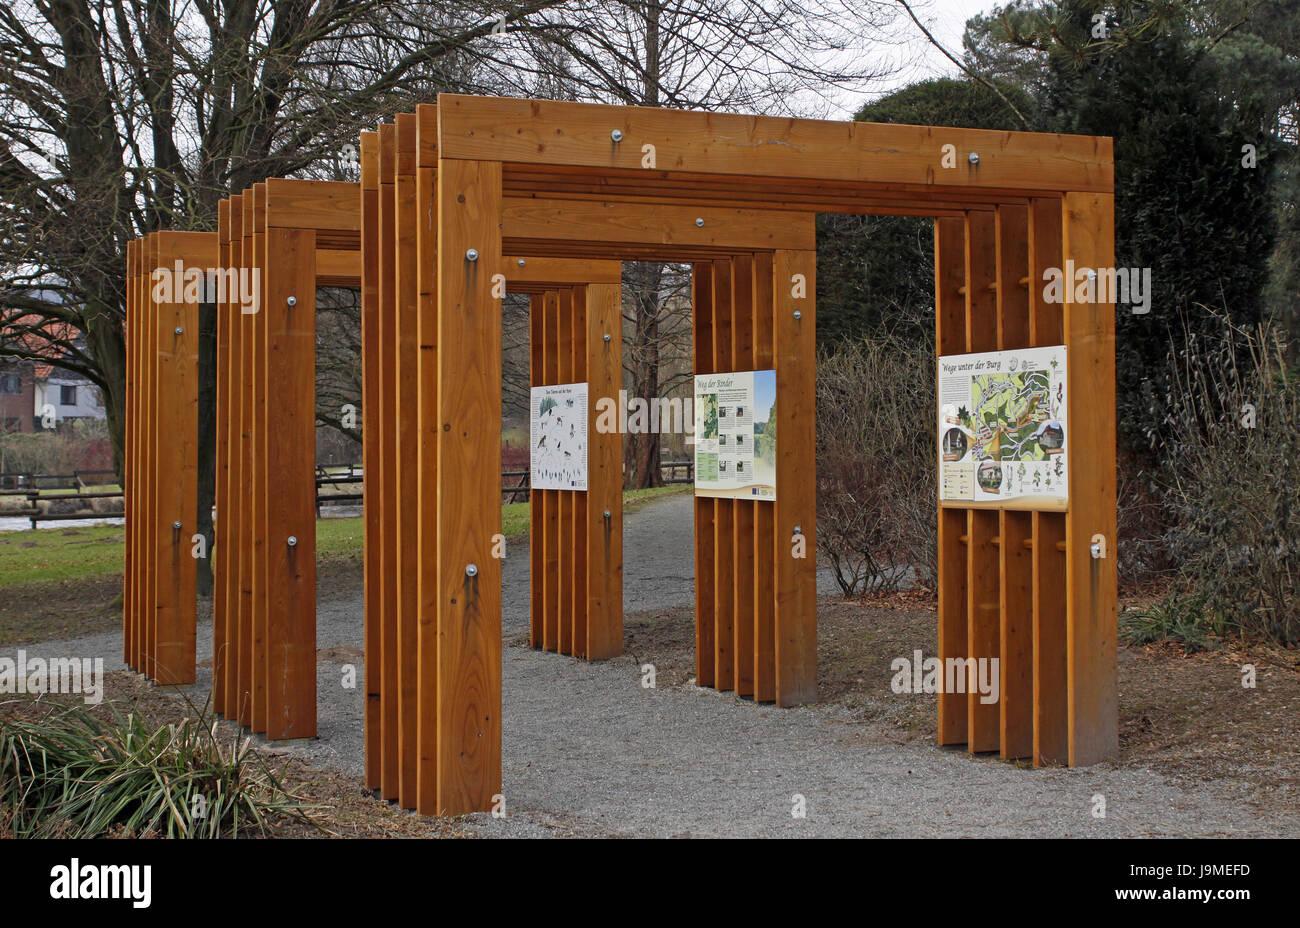 goal, passage, gate, archgway, gantry, spa gardens, boards, goal, passage, Stock Photo